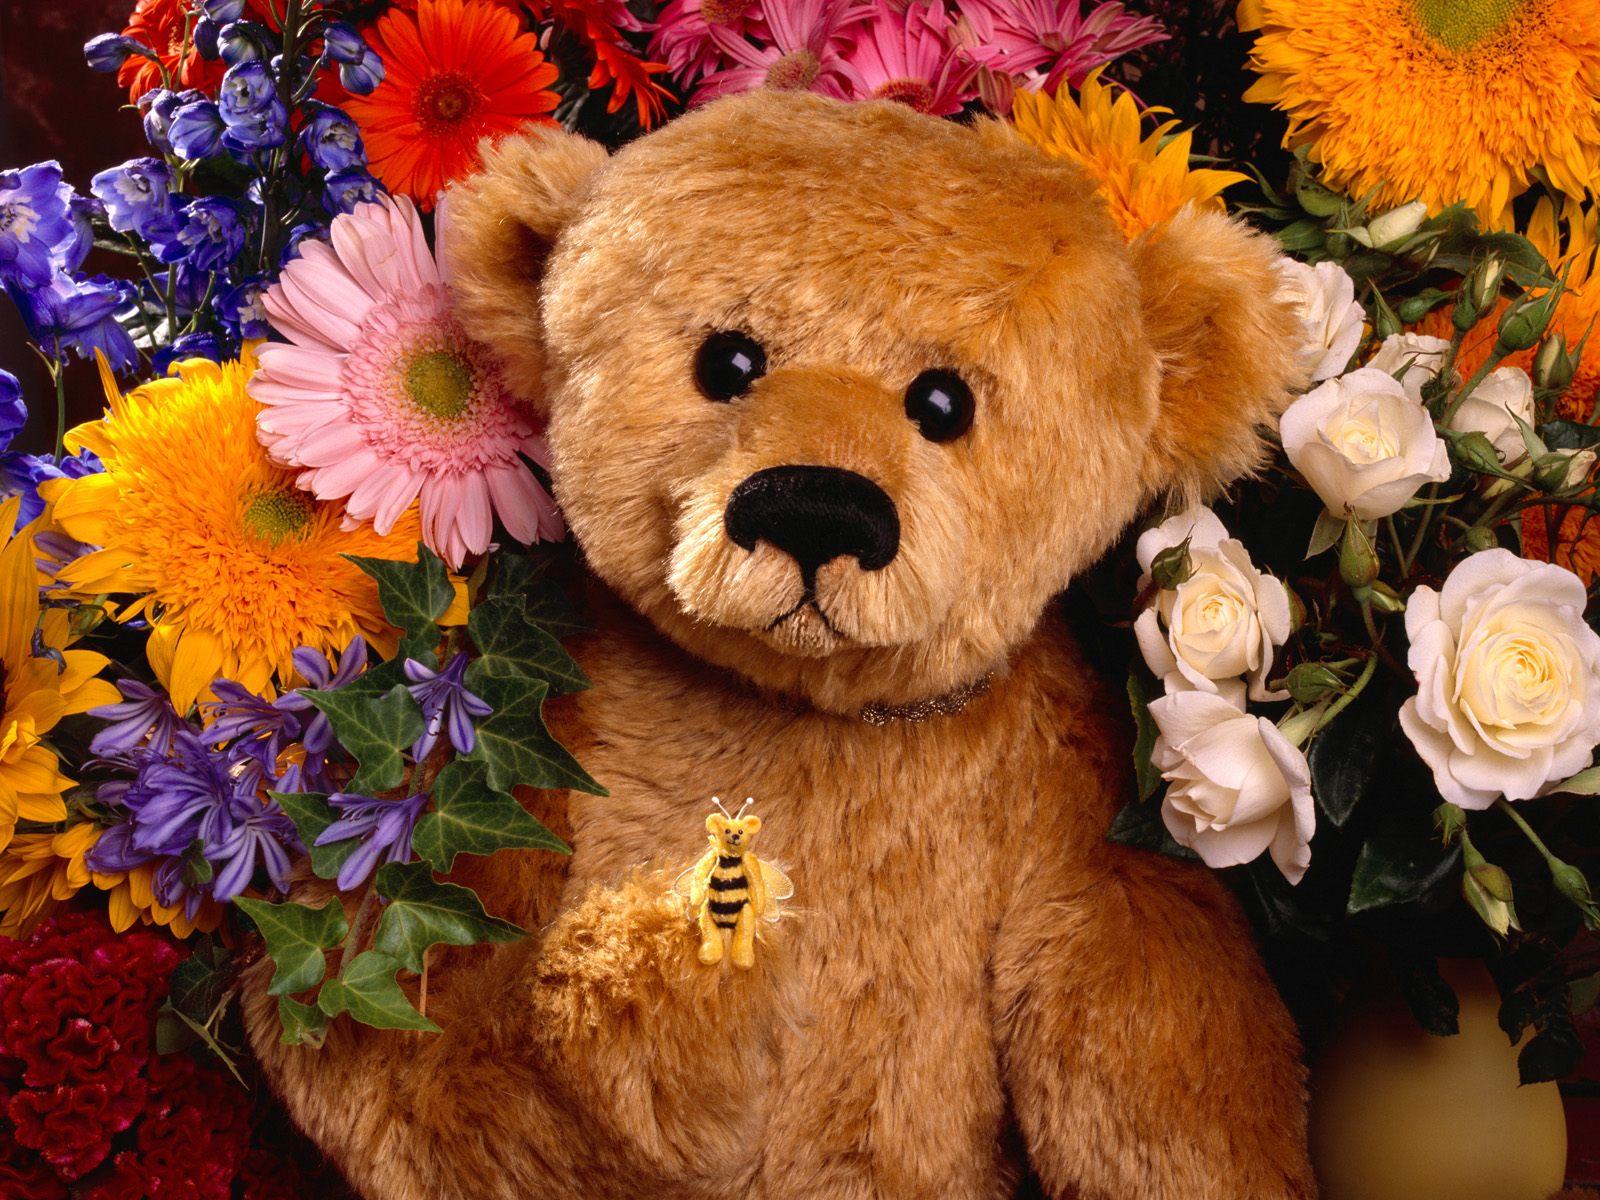 Man Made - Stuffed Animal  Teddy Bear Flower Toy Wallpaper